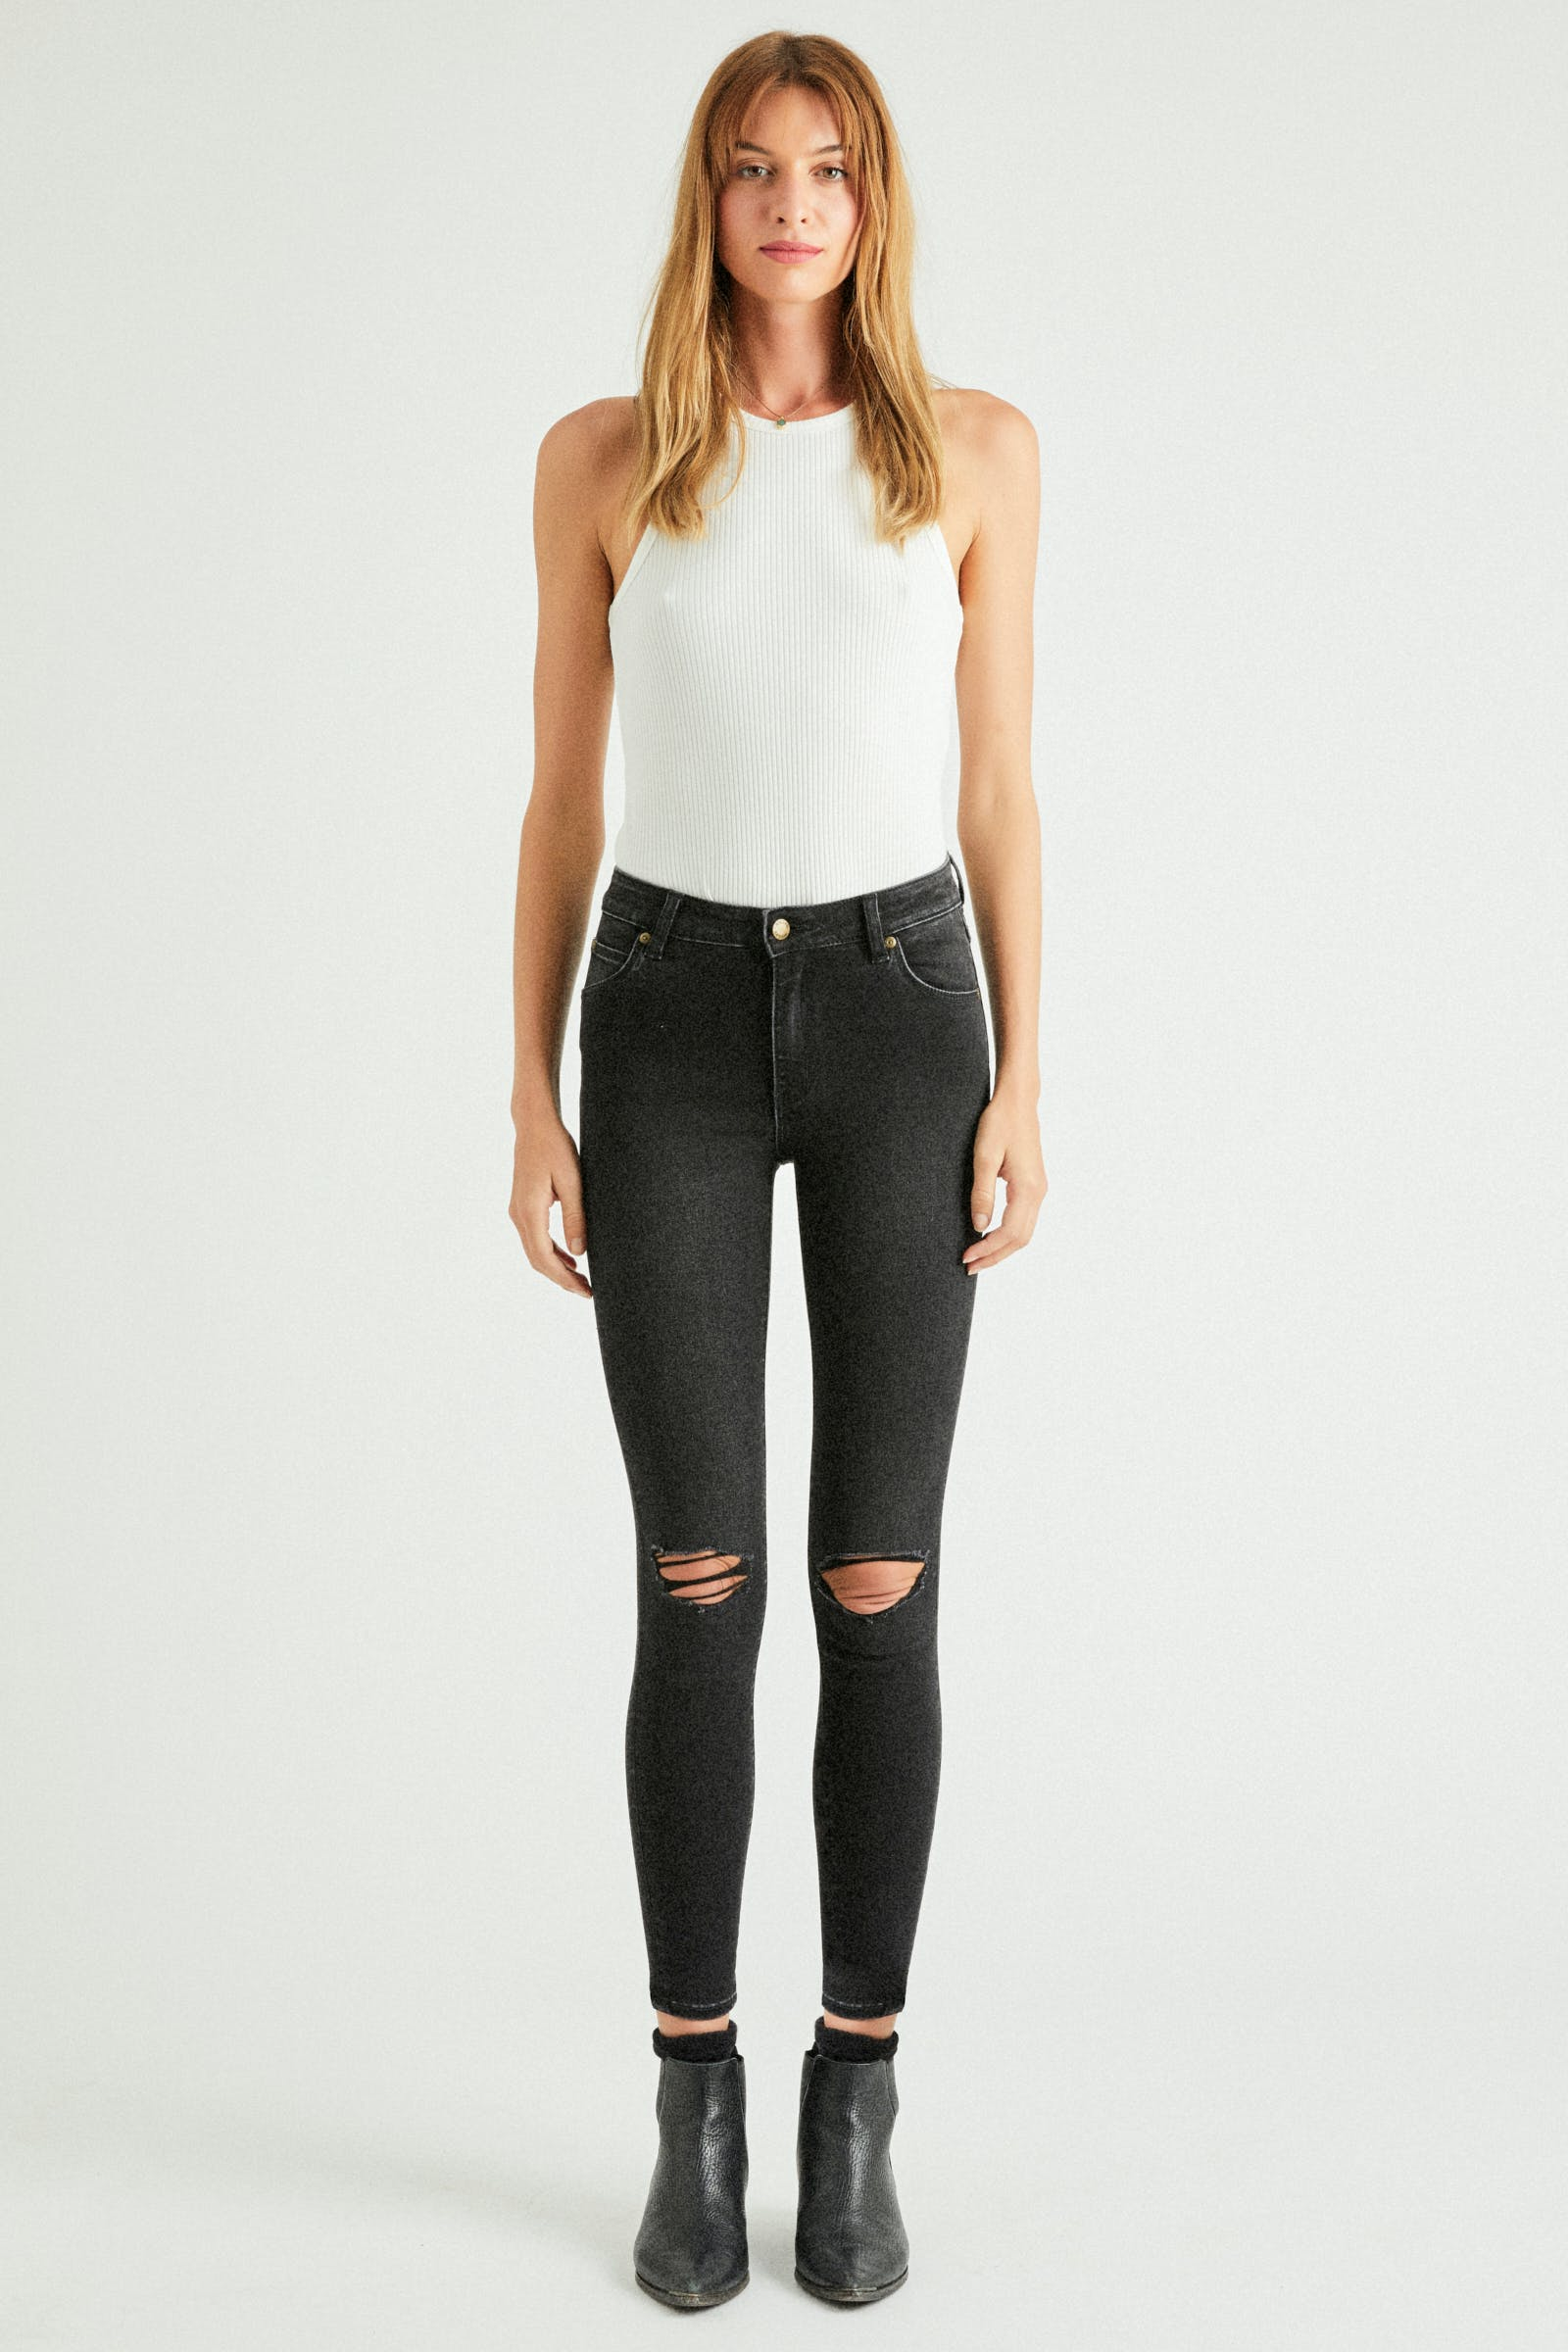 Rolla's Westcoast Skinny Jean